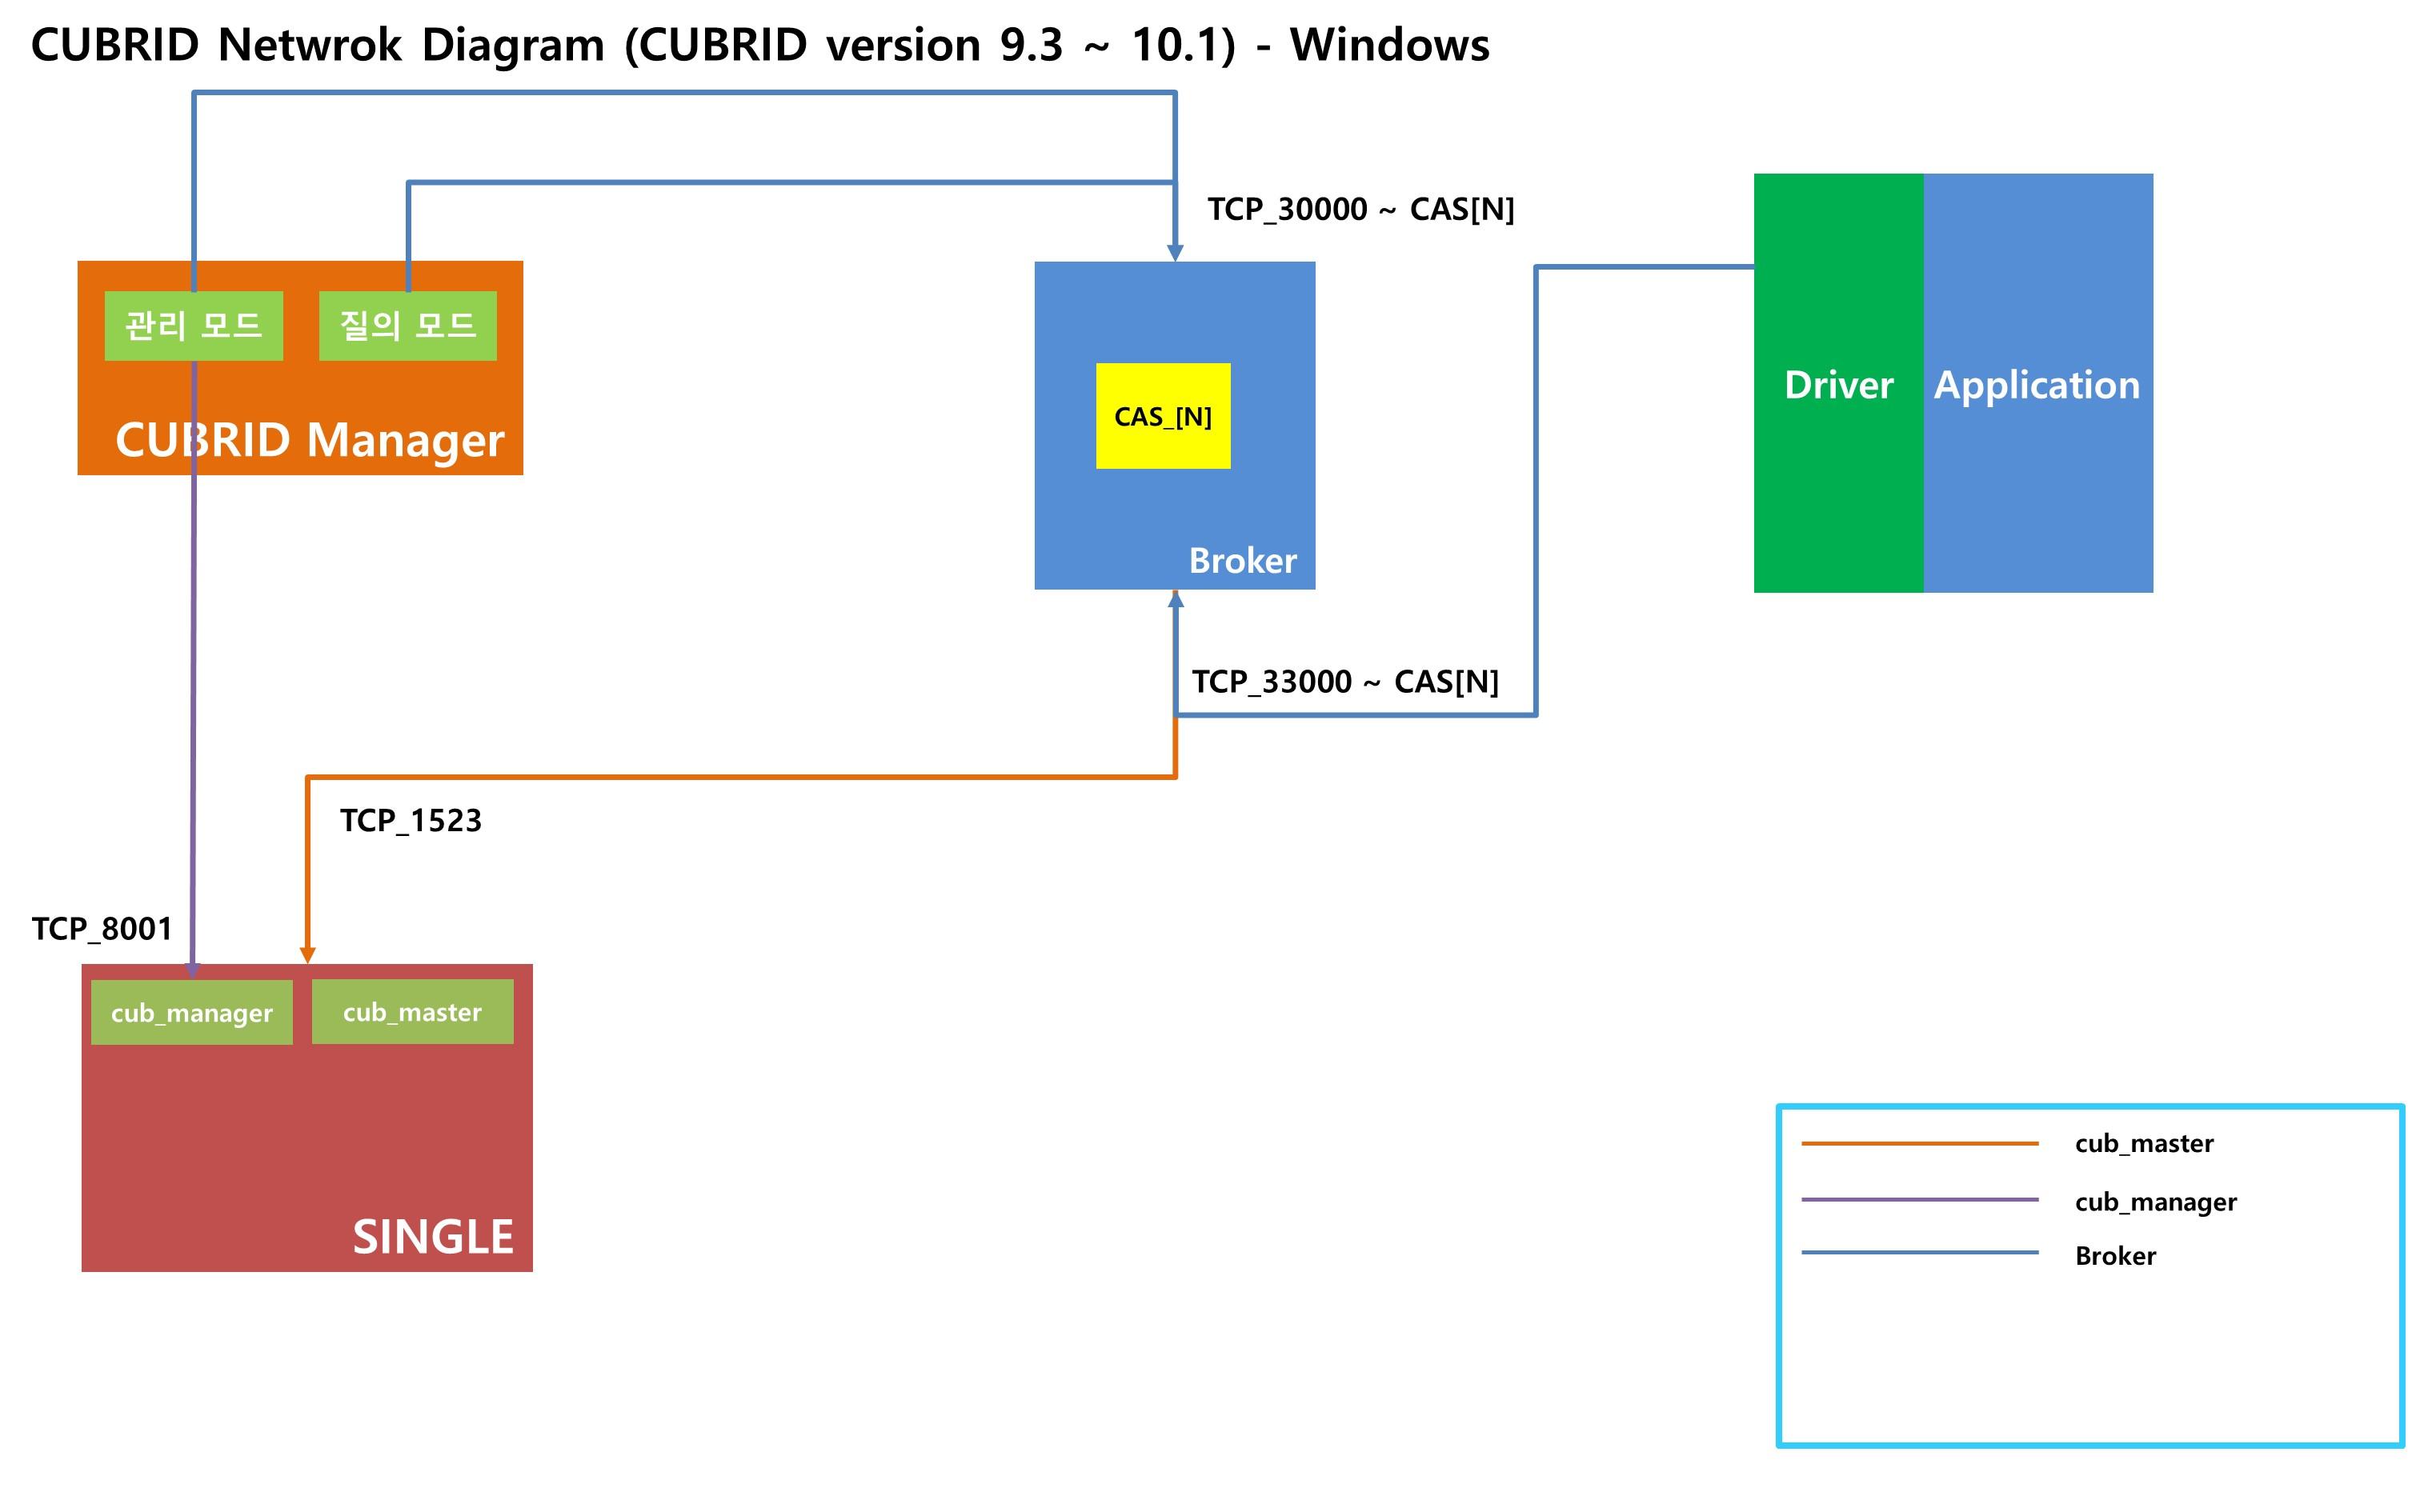 cubrid_network_single.jpg